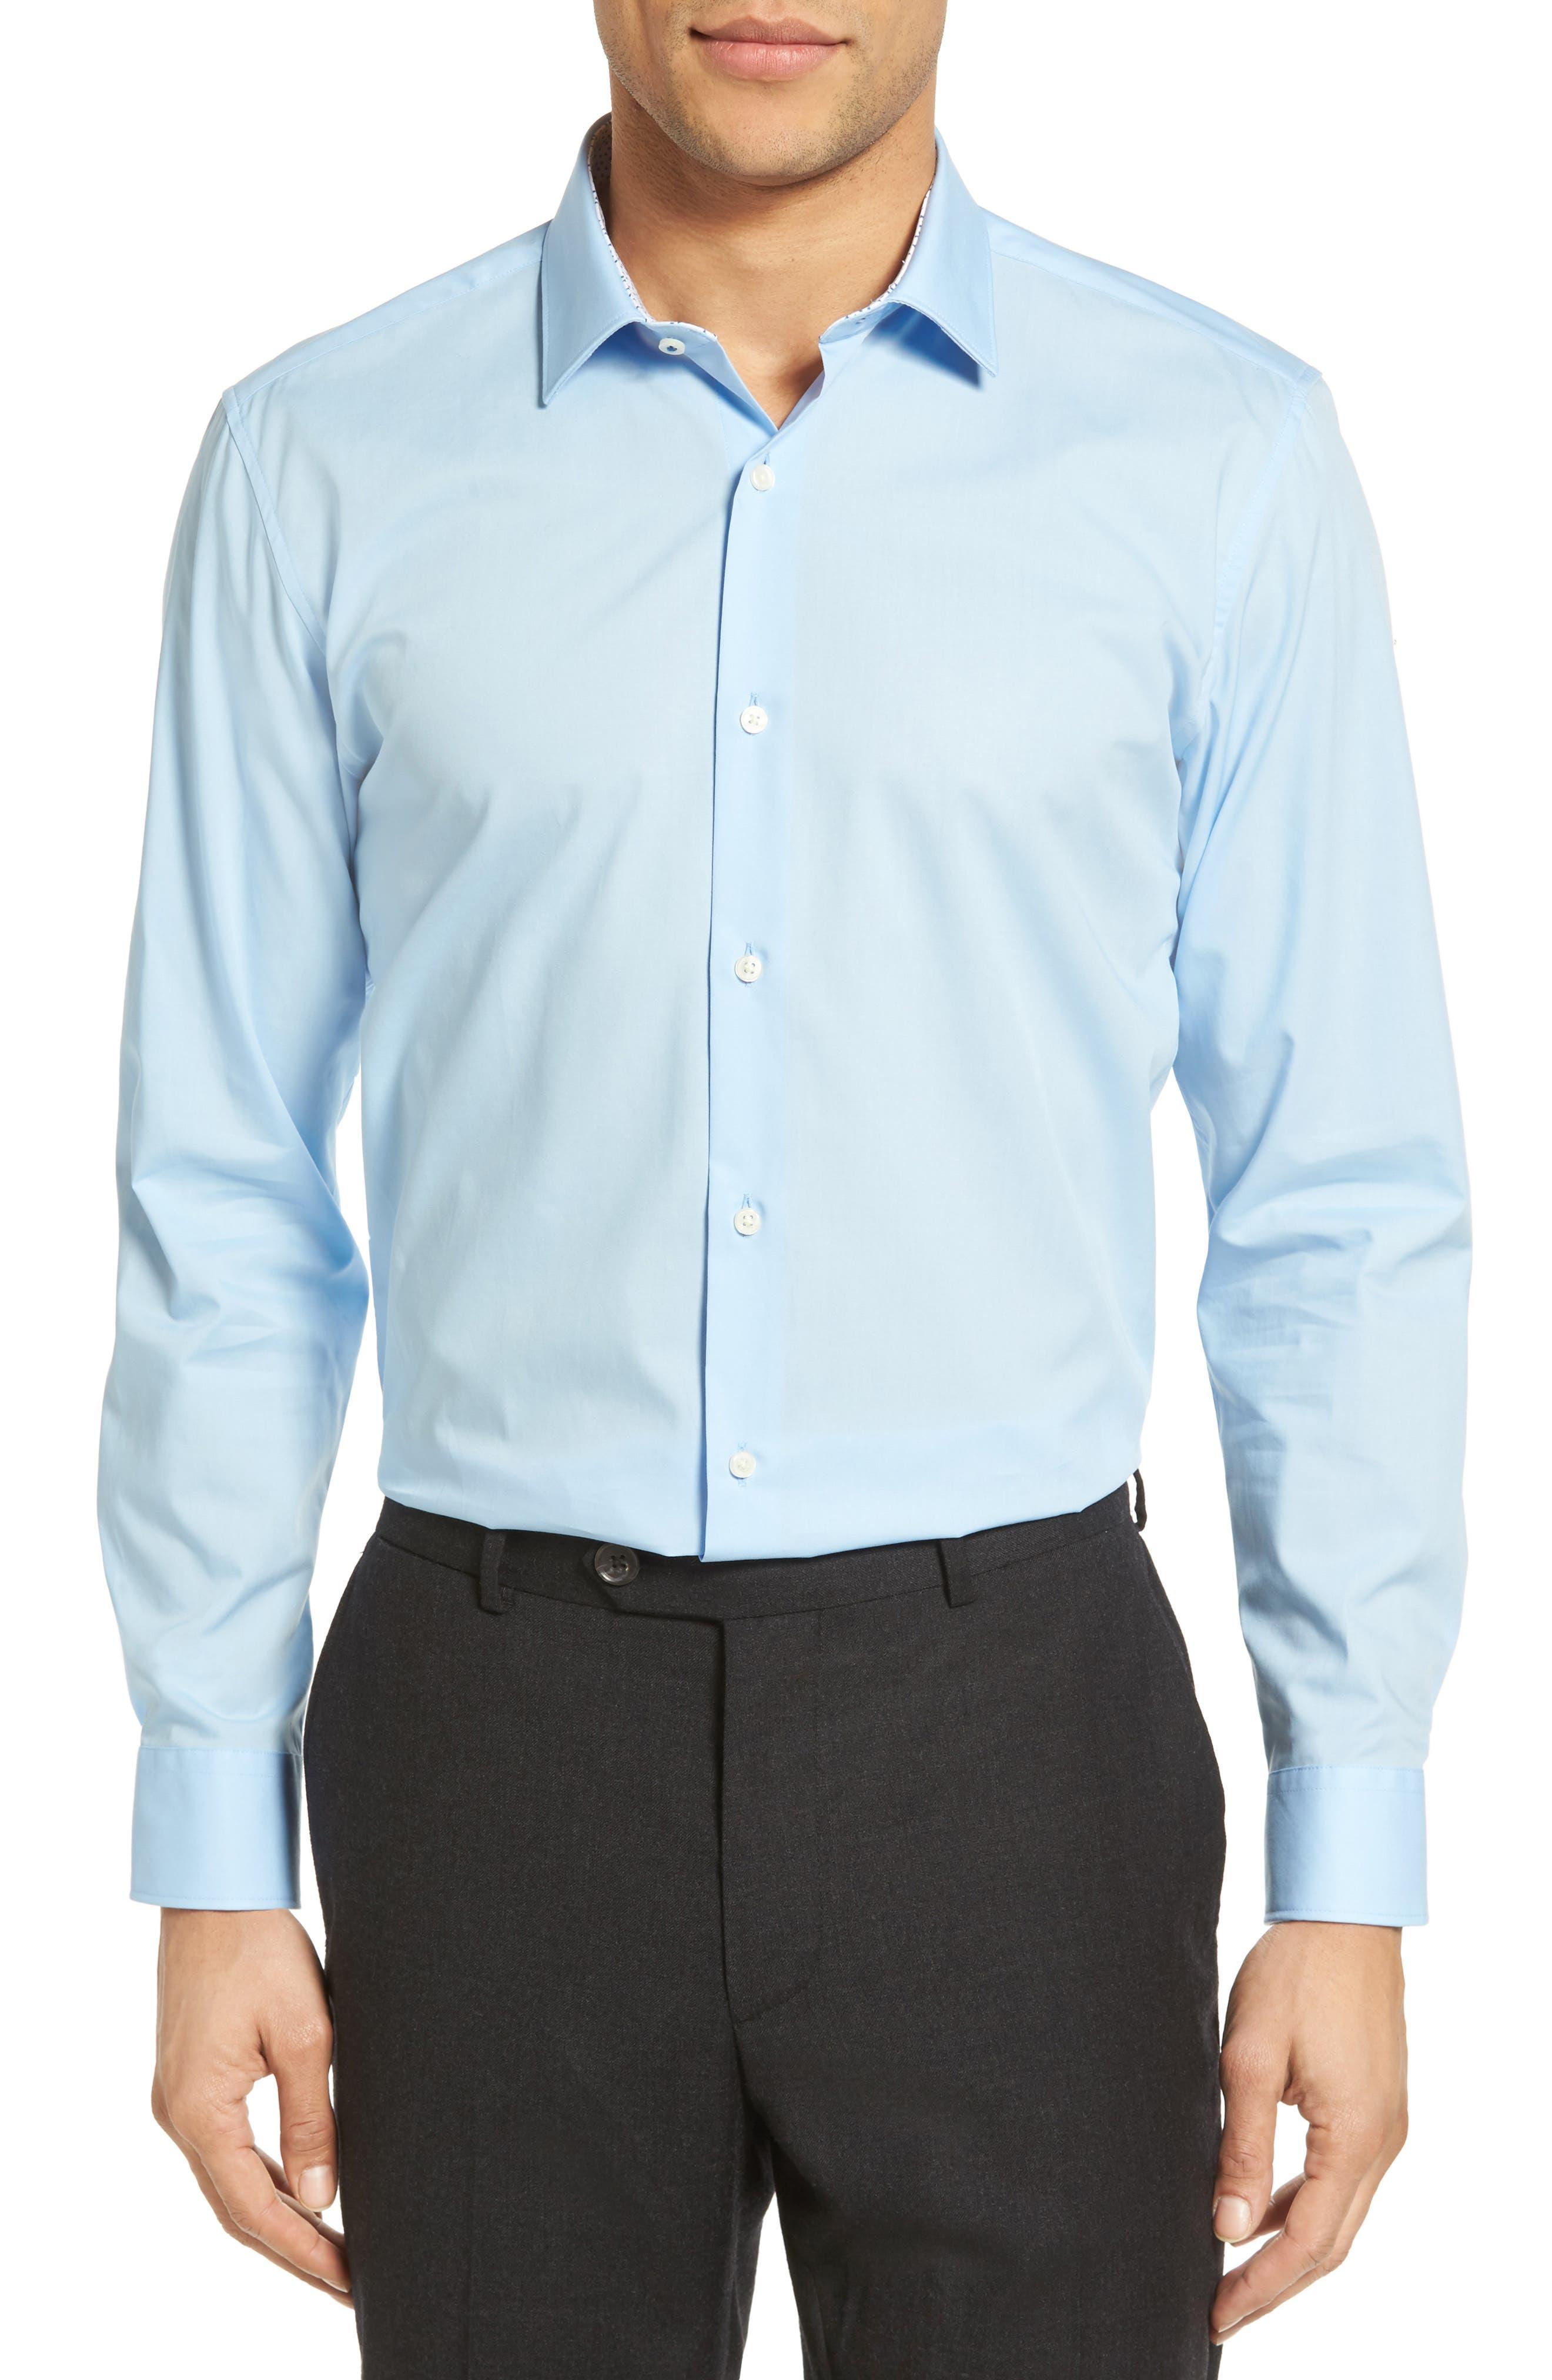 Booker Slim Fit Dress Shirt,                             Main thumbnail 2, color,